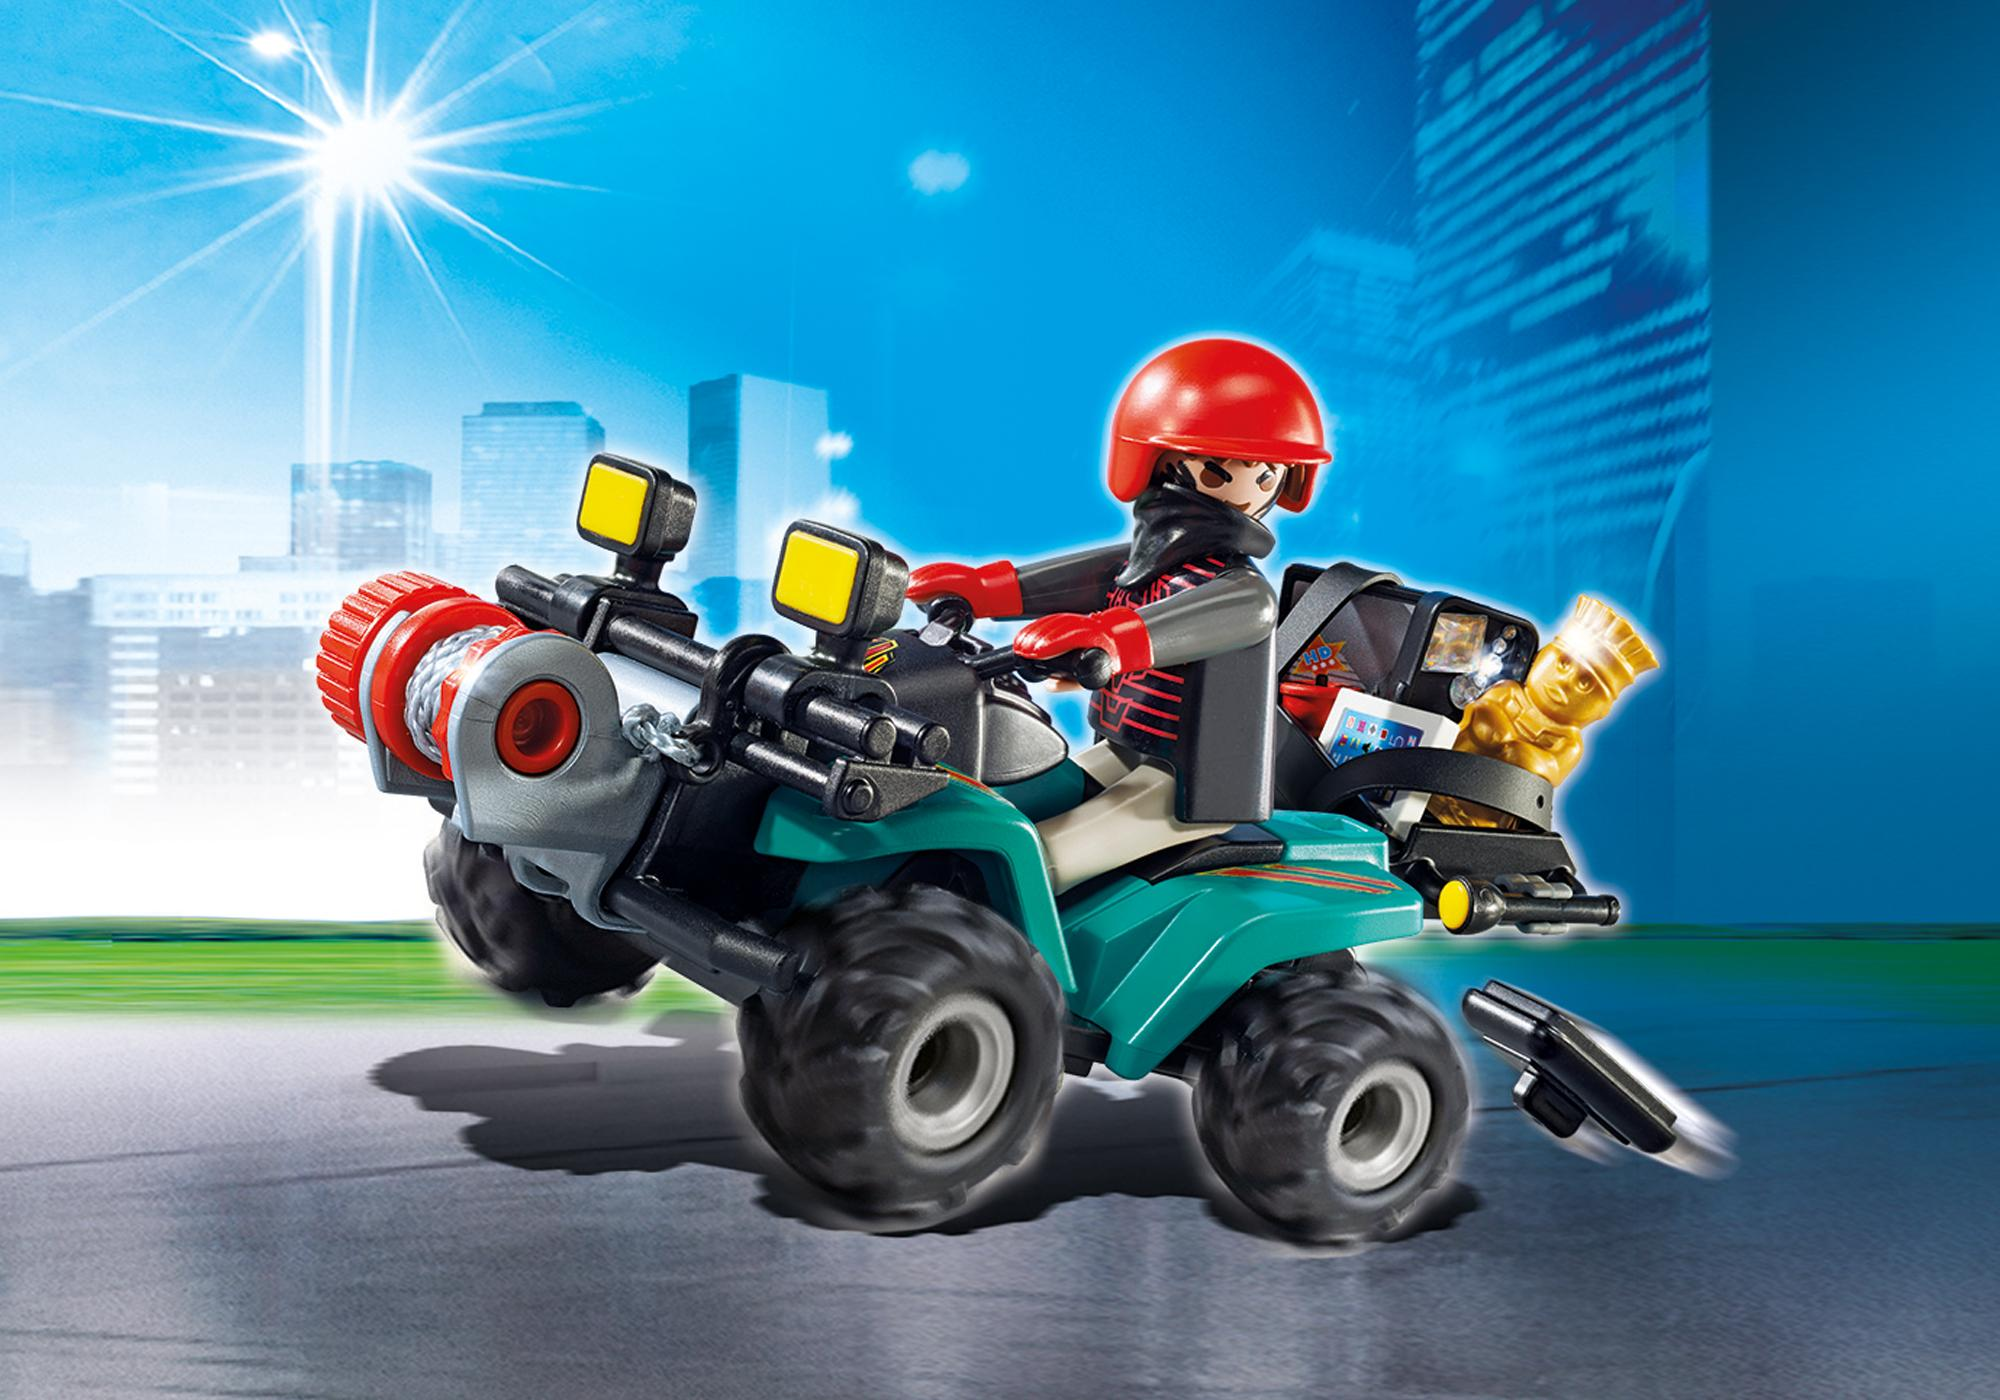 http://media.playmobil.com/i/playmobil/6879_product_detail/Quad avec treuil et bandit